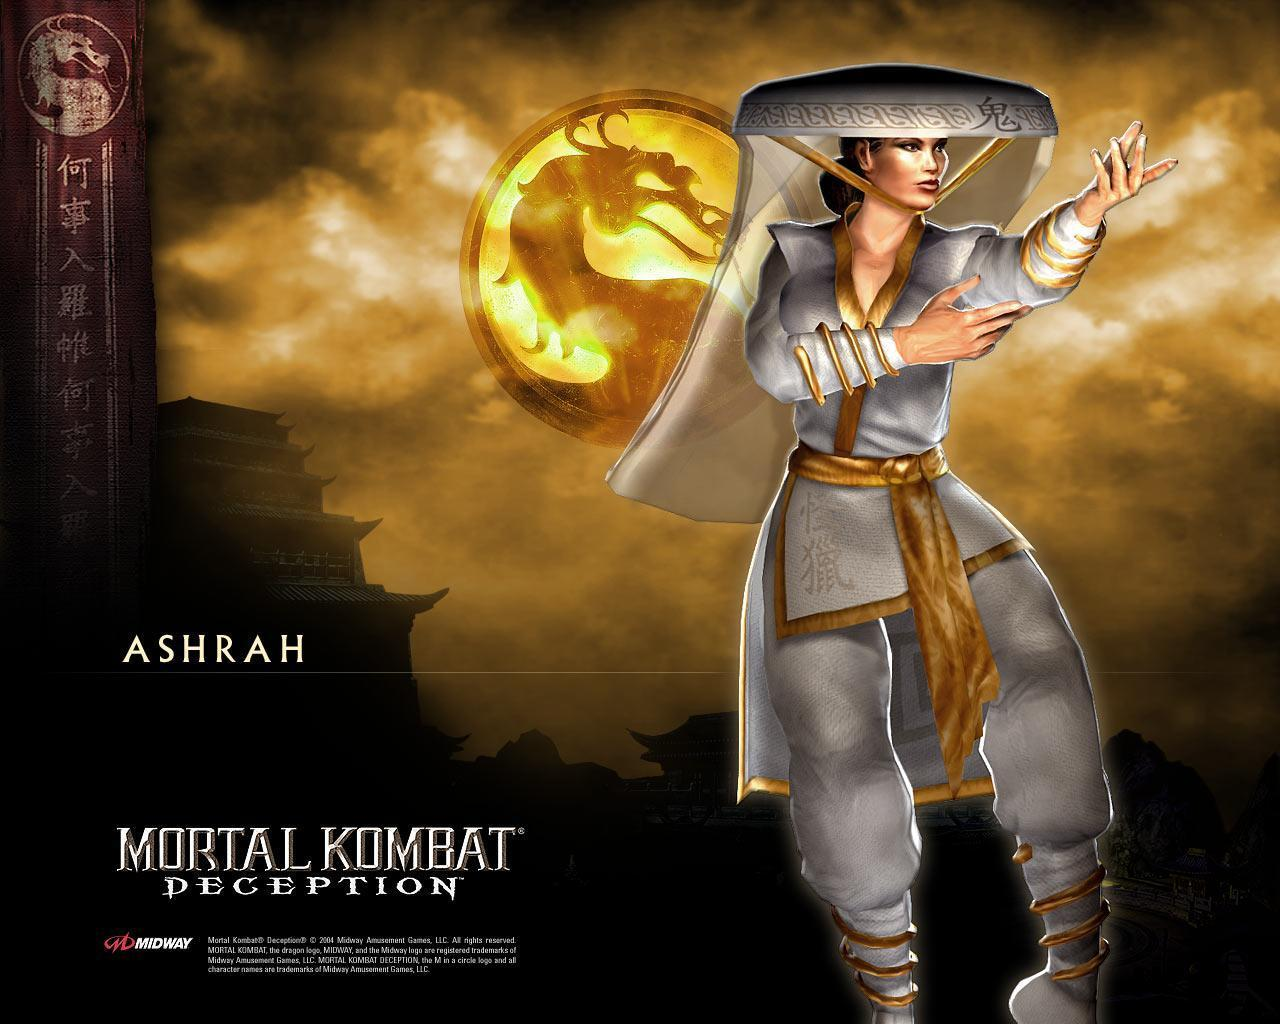 Mortal Kombat images MK wallpapers wallpaper photos 27864310 1280x1024